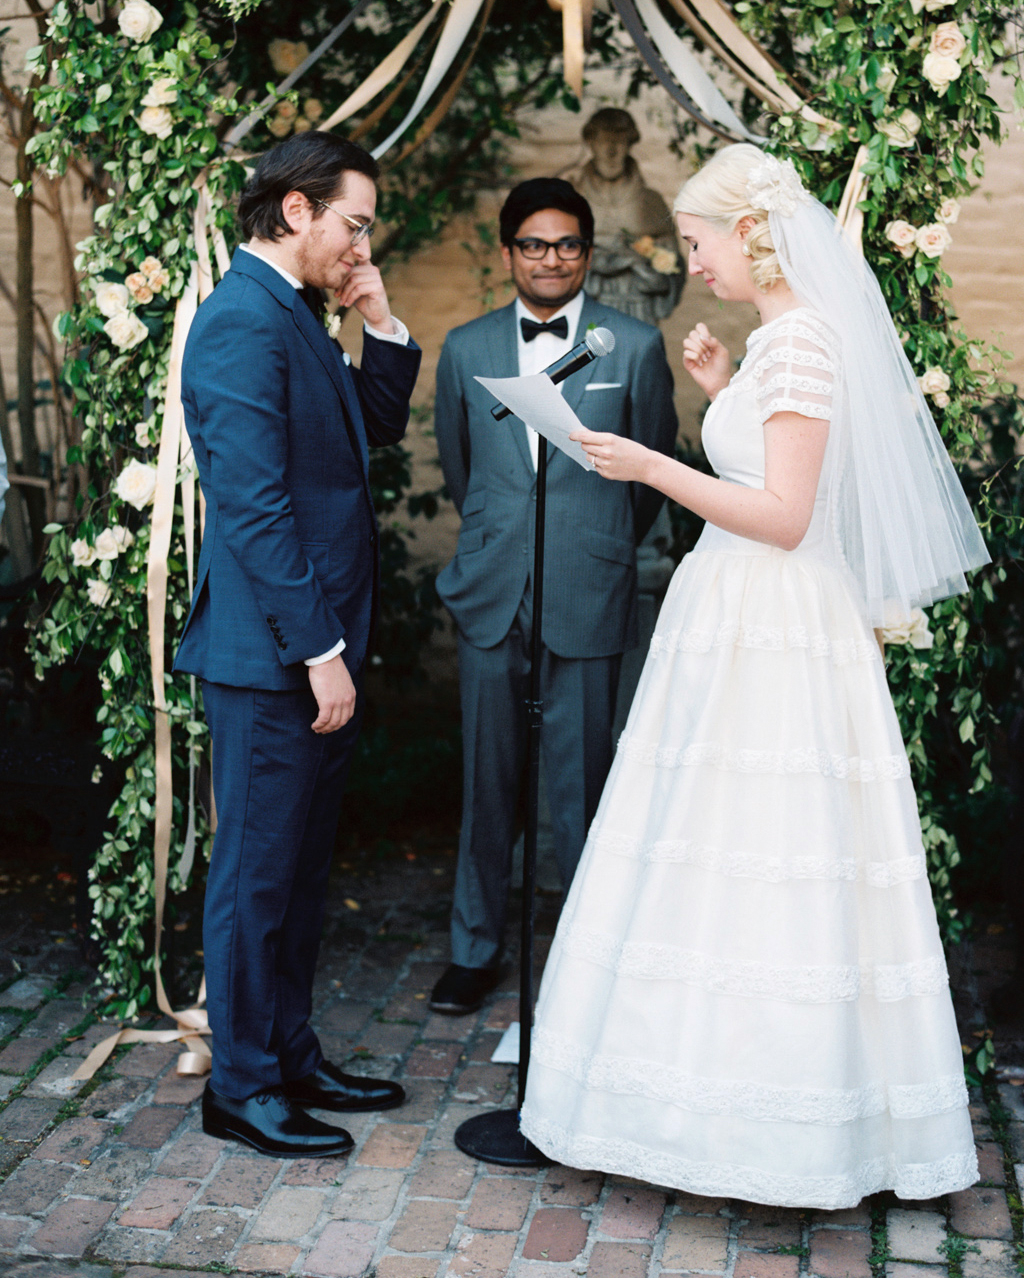 jessica-graham-wedding-ceremony-0089-s112171-0915.jpg